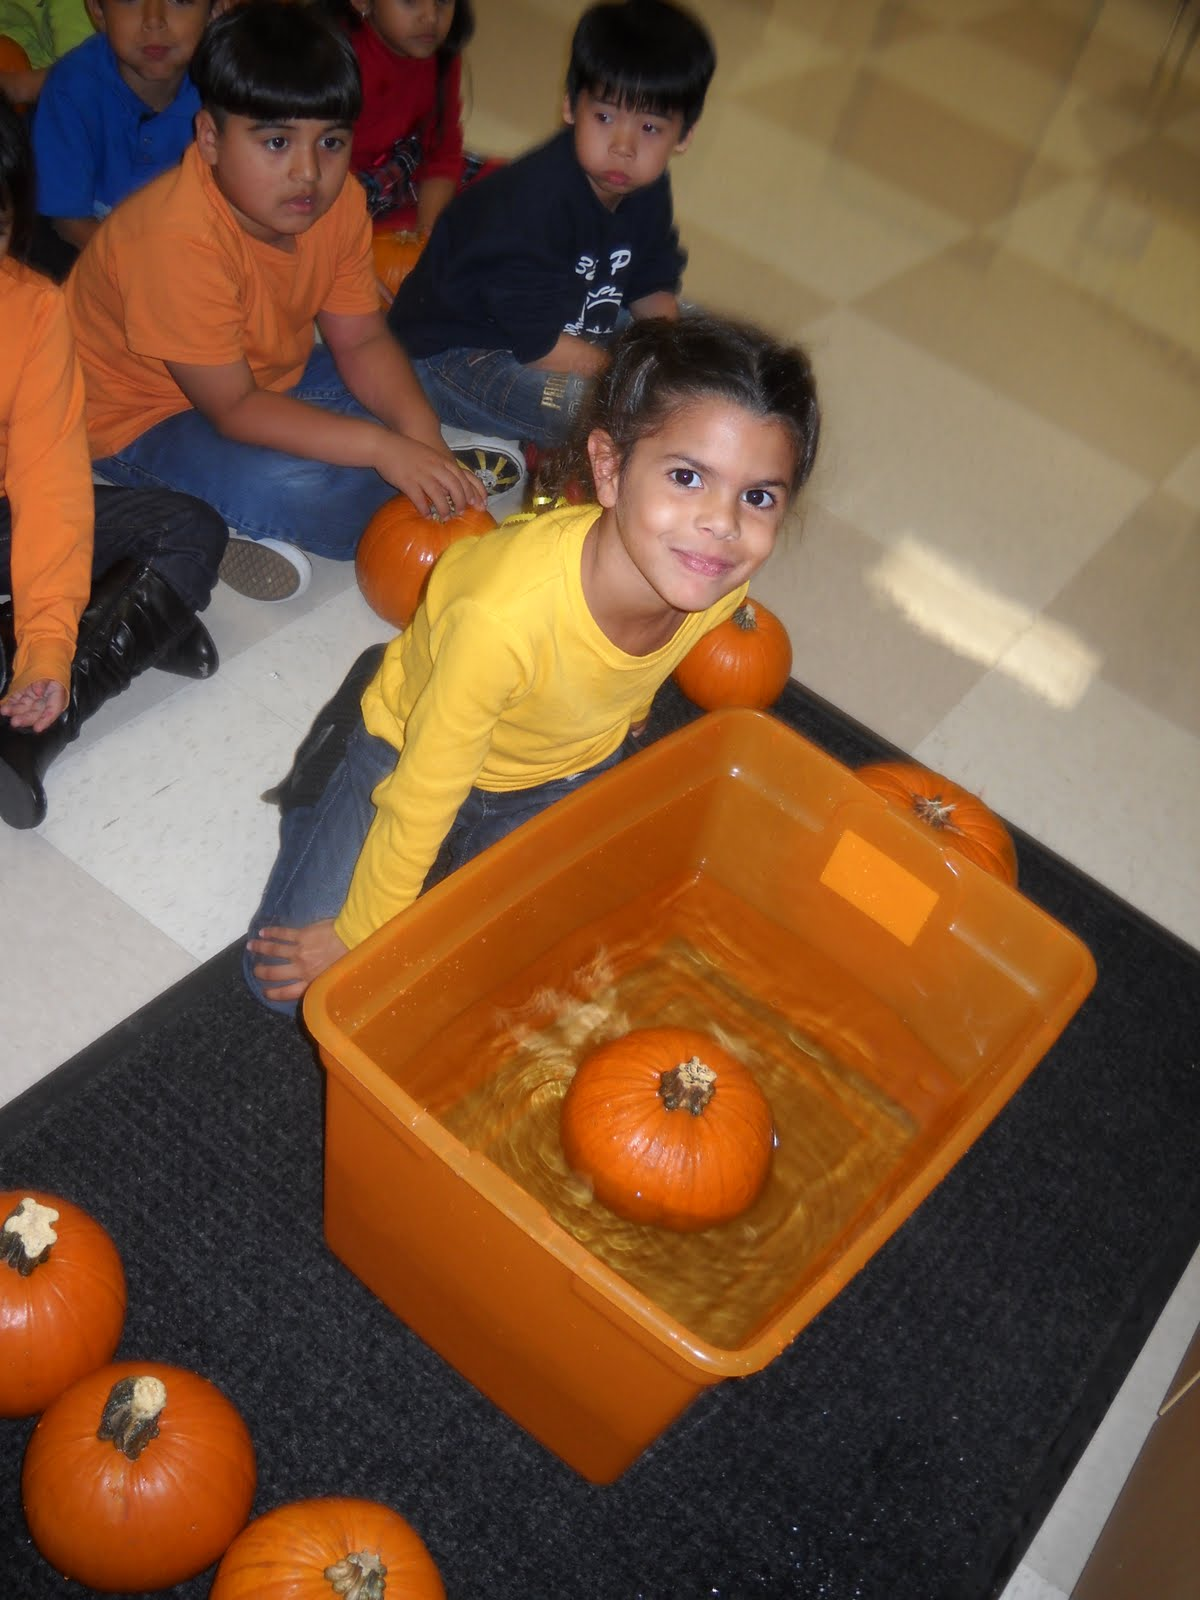 Kinder Garden: Mrs. Wood's Kindergarten Class: Do Pumpkins Sink Or Float?